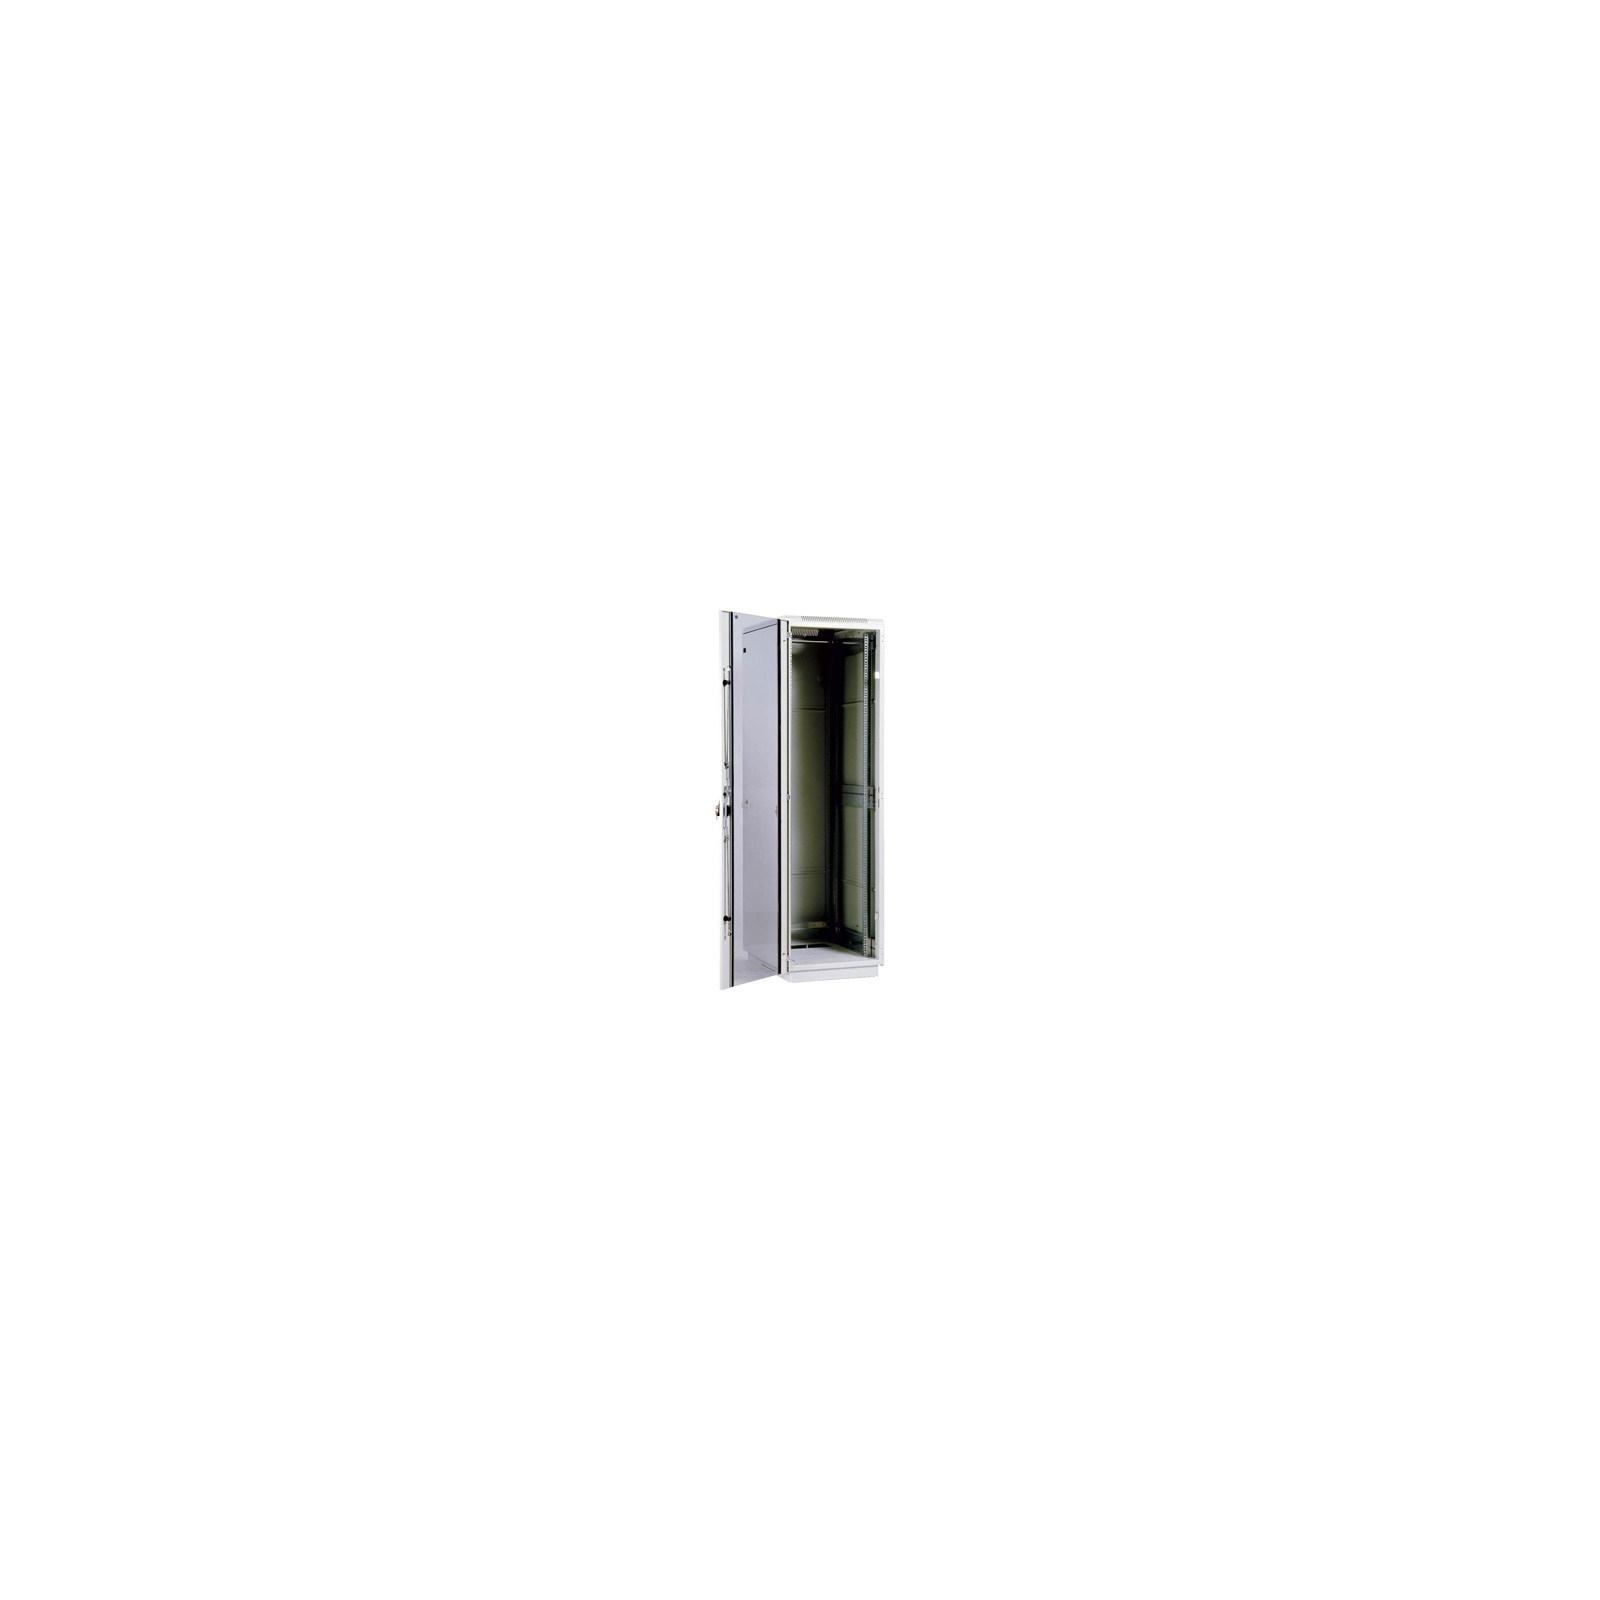 Шкаф напольный 22U ЦМО (ШТК-М-22.6.6-1ААА)